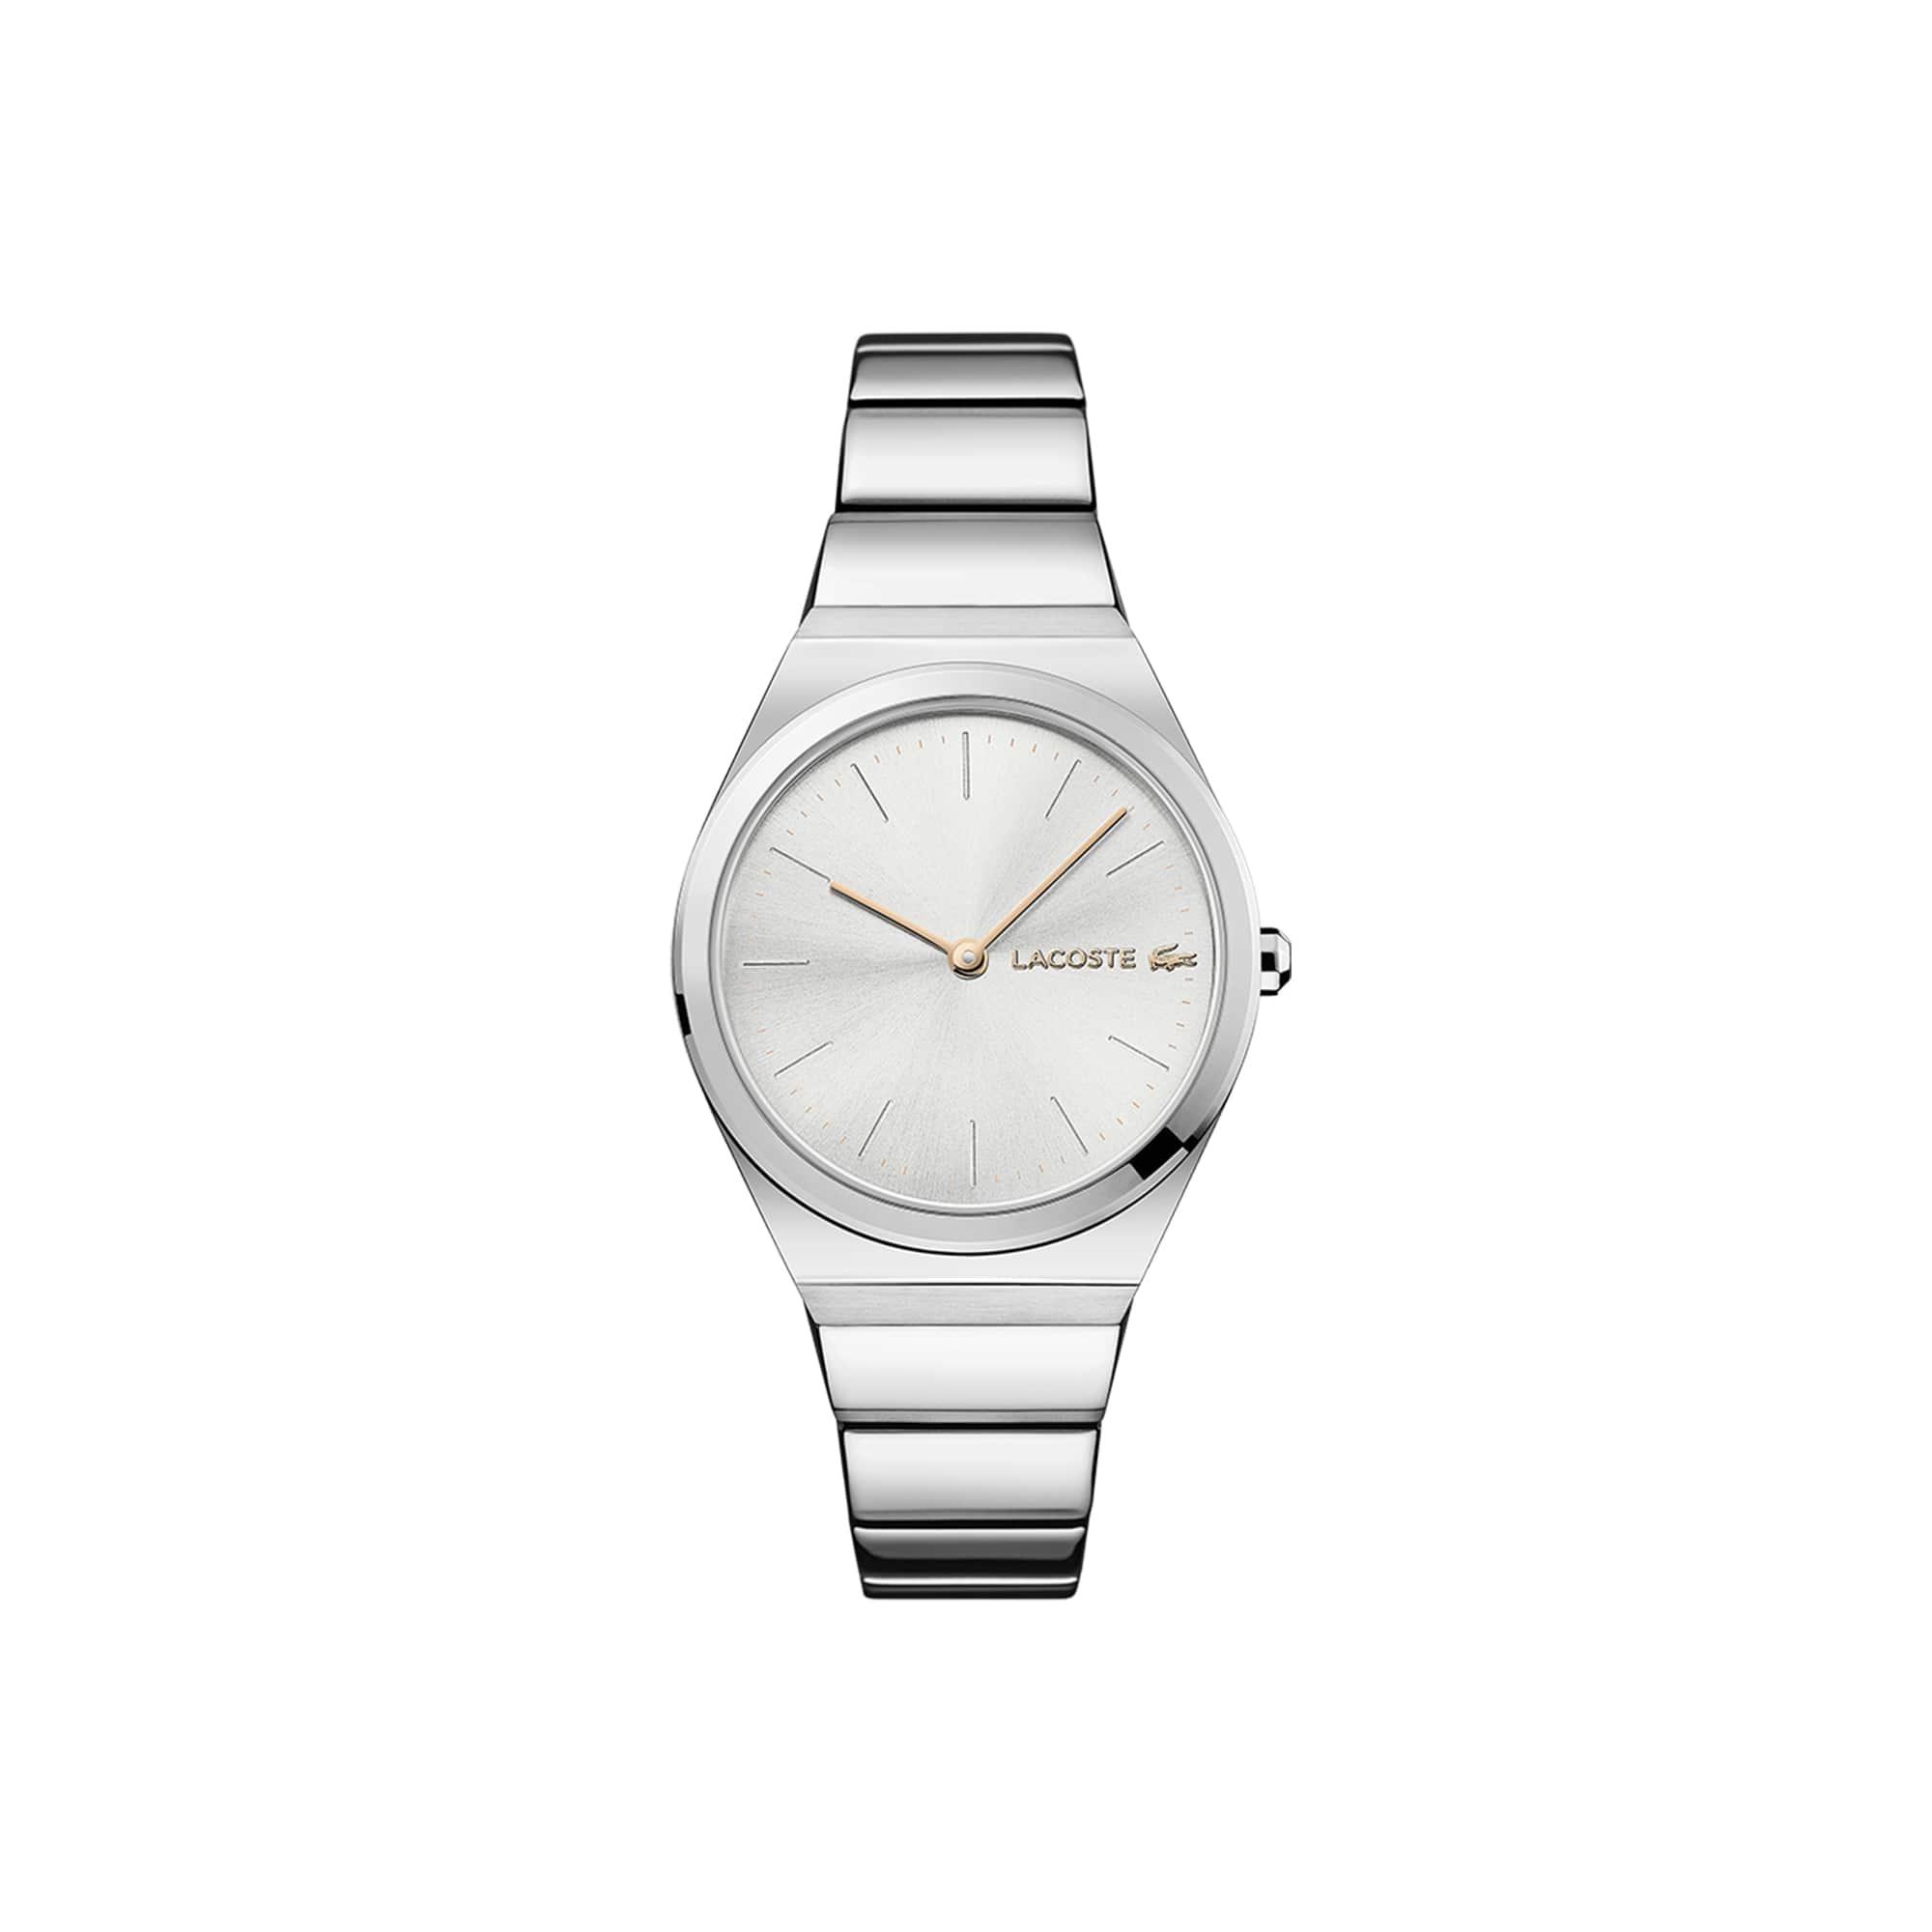 d6724abc01e Horloge Mia dames met roestvaststalen band